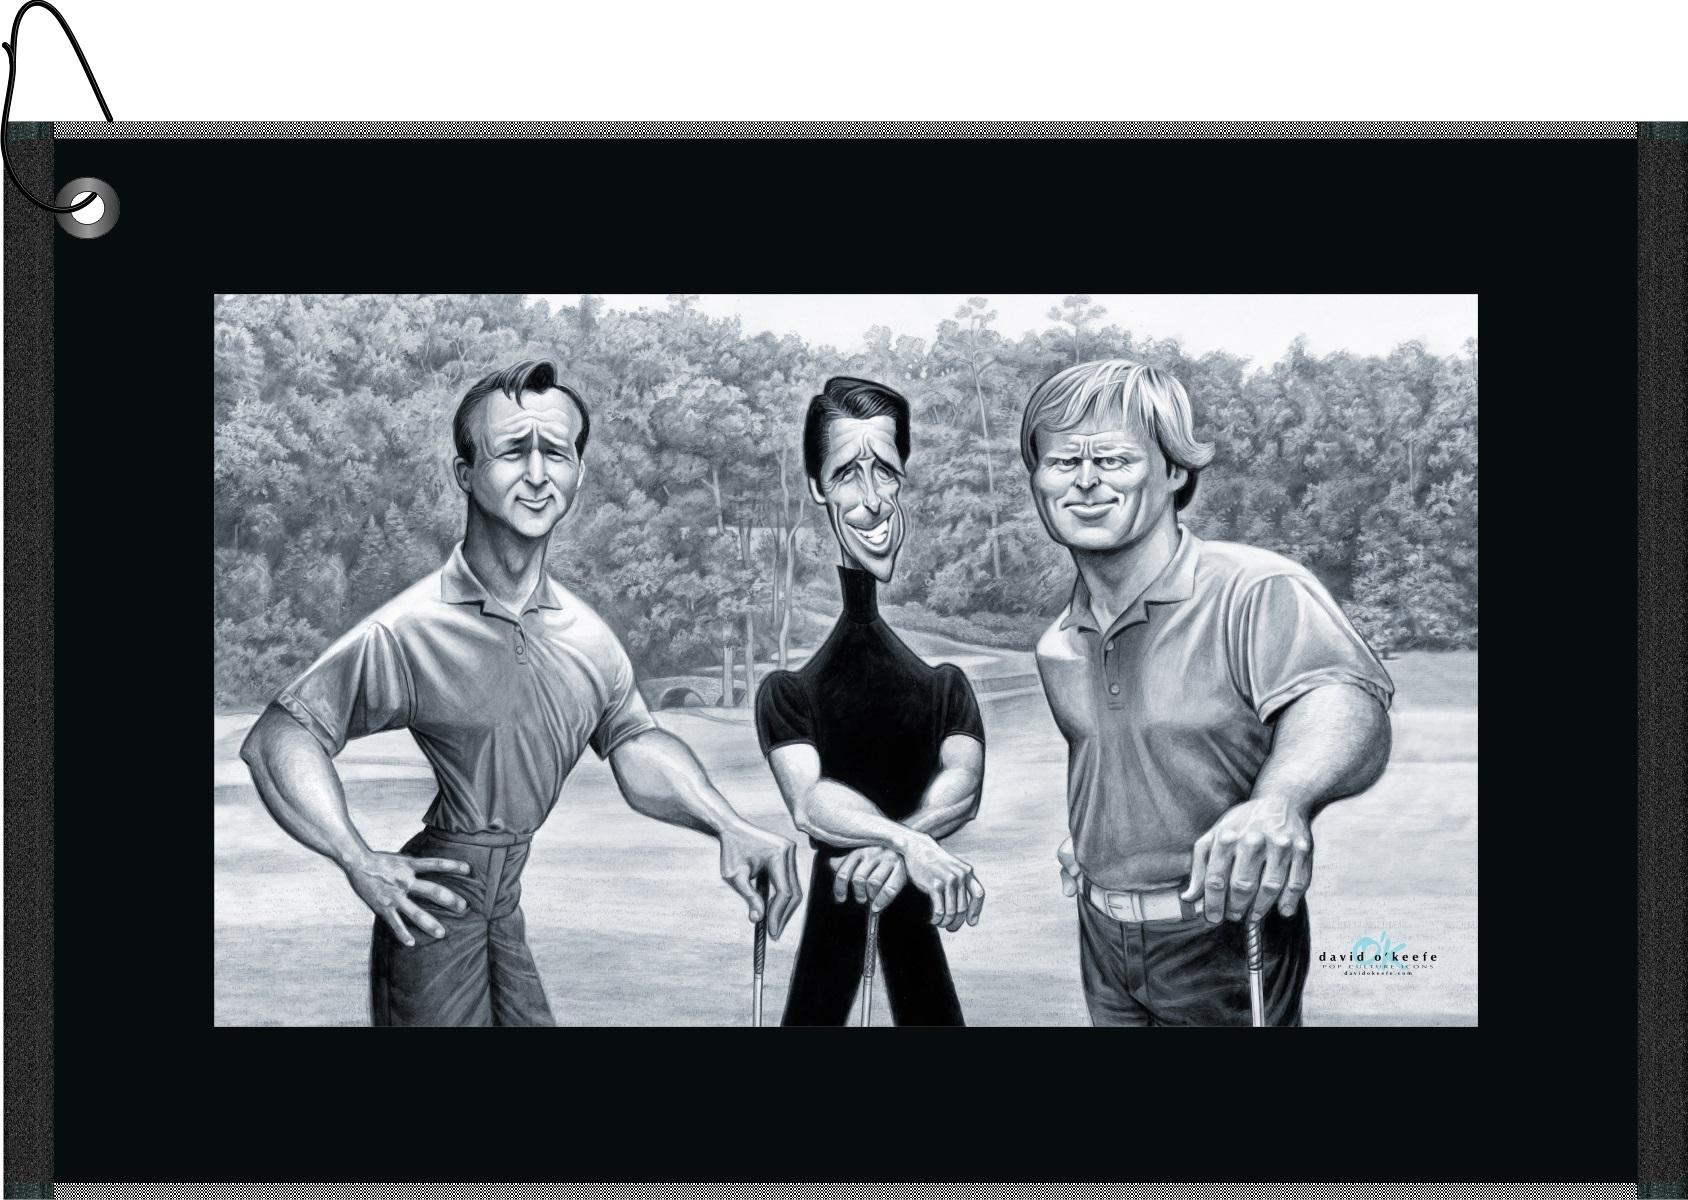 Devant Big Three Golf Towel | RockBottomGolf.com on golf coasters, golf sunglasses, golf cups, golf bedding, golf clothing, golf dishes, golf uniforms, golf food, golf hats, golf paper, golf license plate frames, golf accessories, golf games,